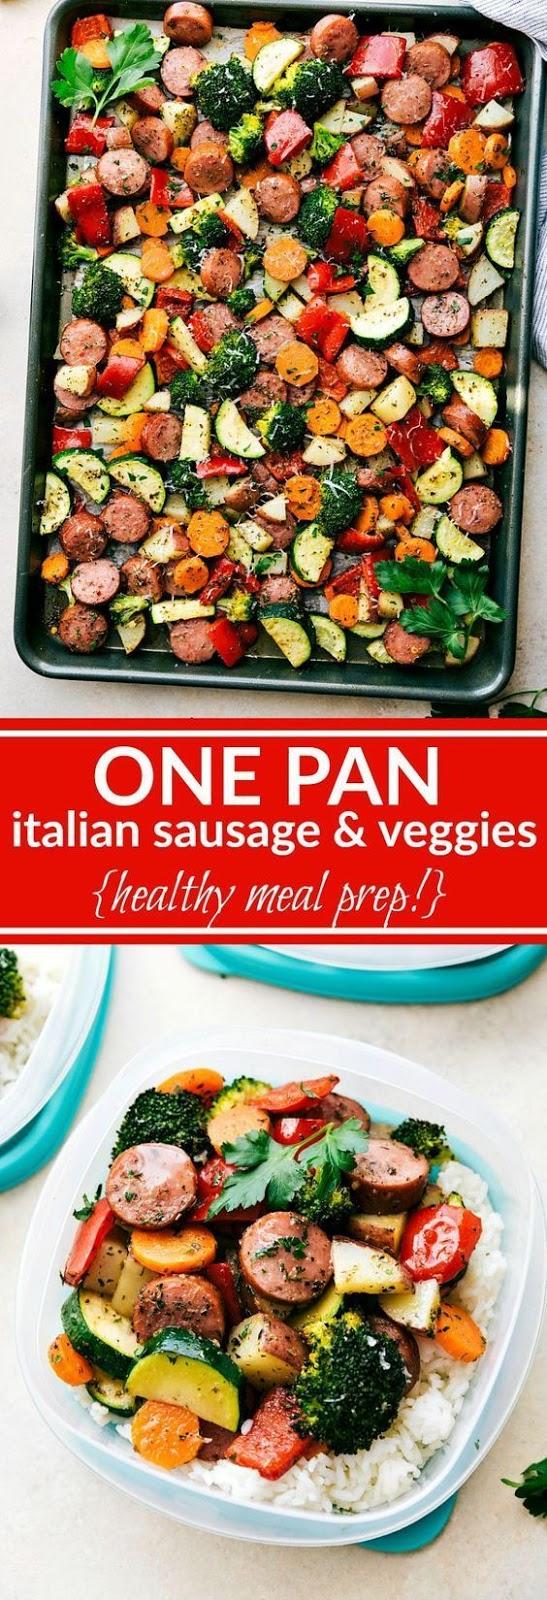 One Pan Italian Sausage and Veggies